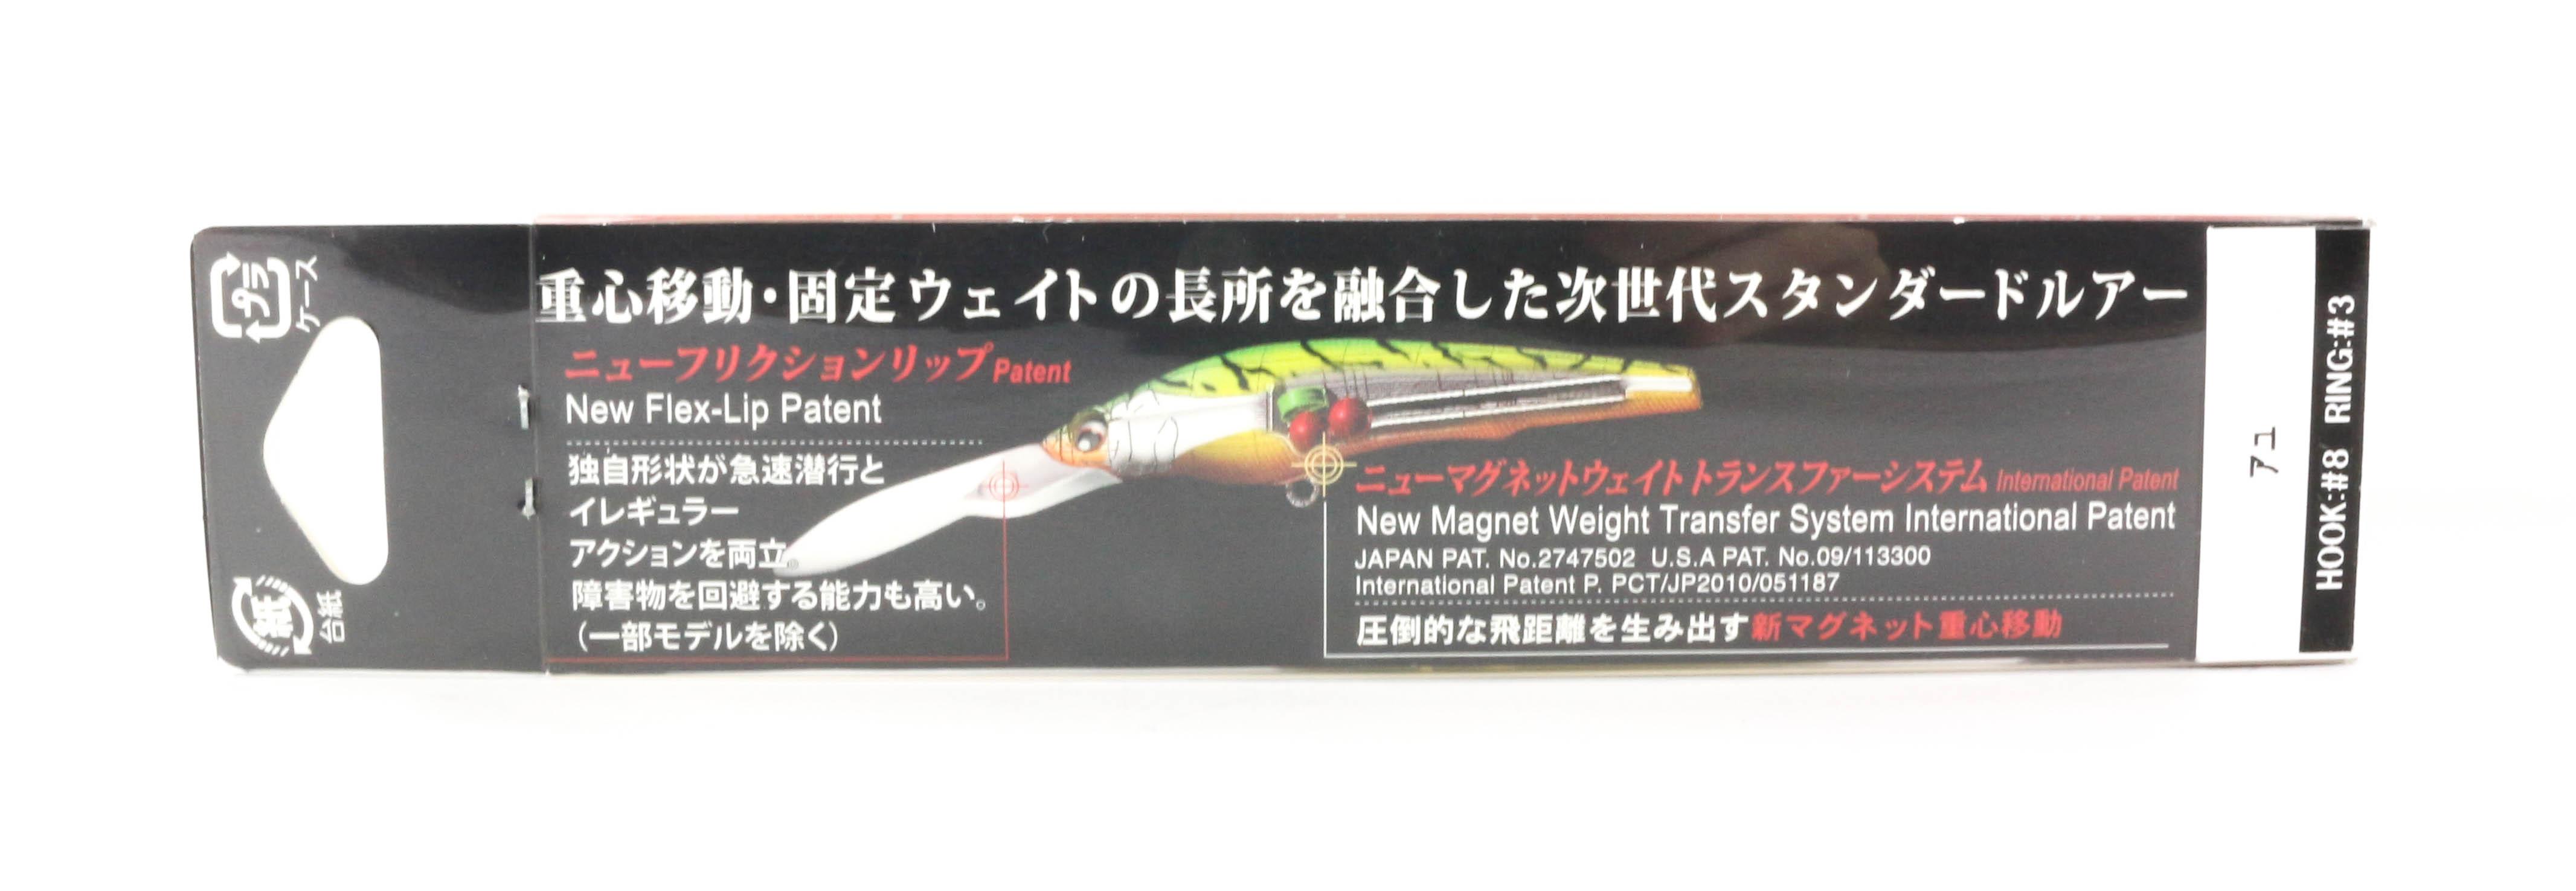 9331 Yo Zuri Duel Hardcore Longbill 90SP Suspend Crank Bait Lure R1182-HHT